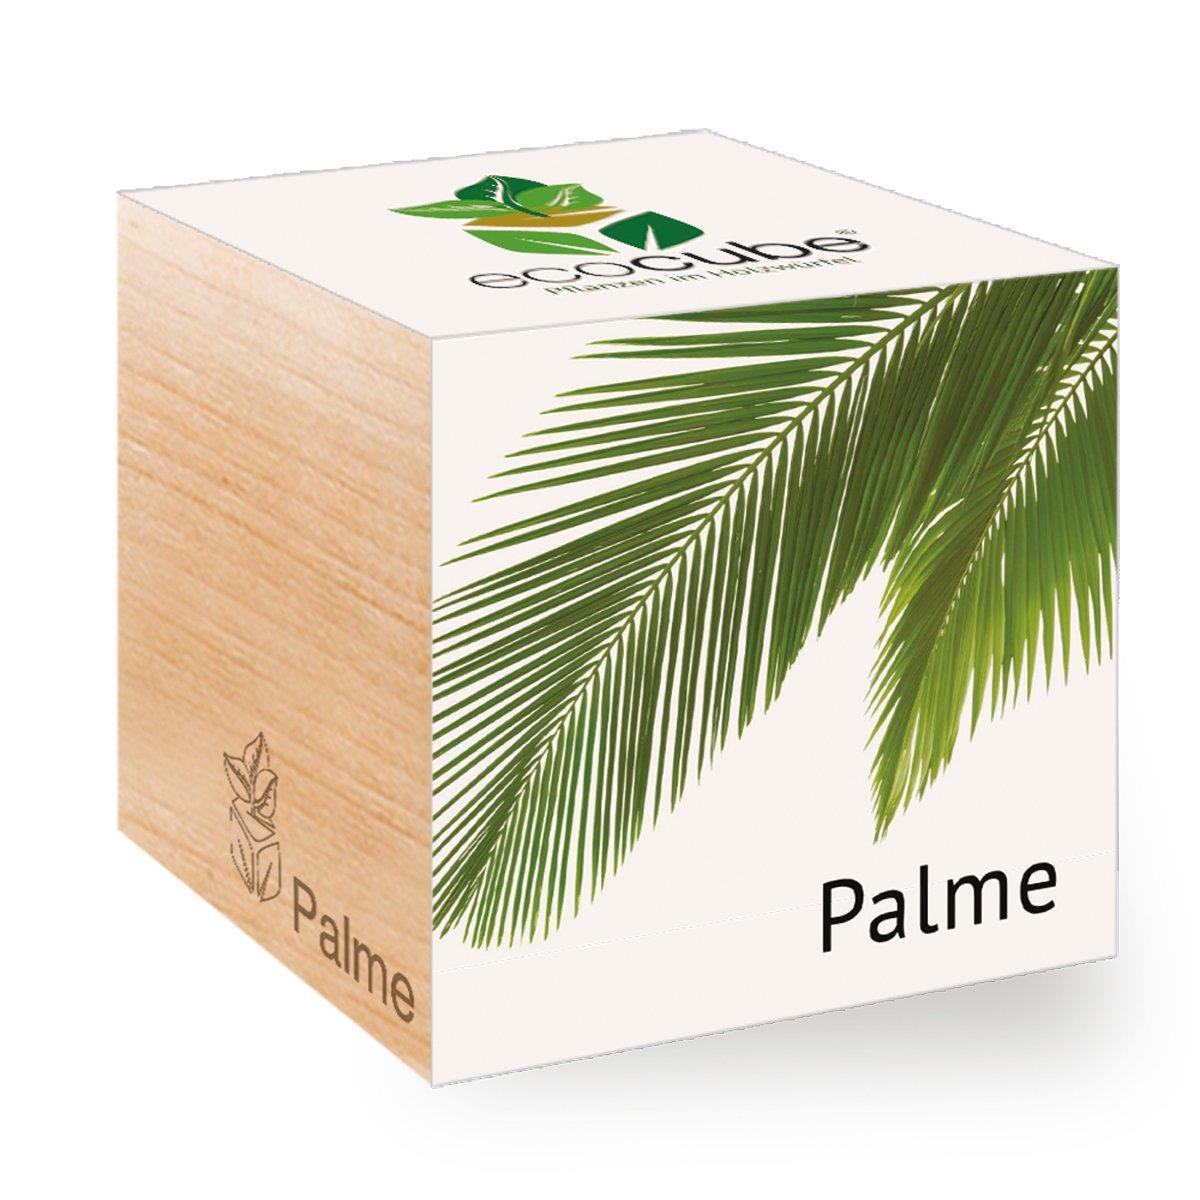 Palme im Holzwü rfel Ecocube